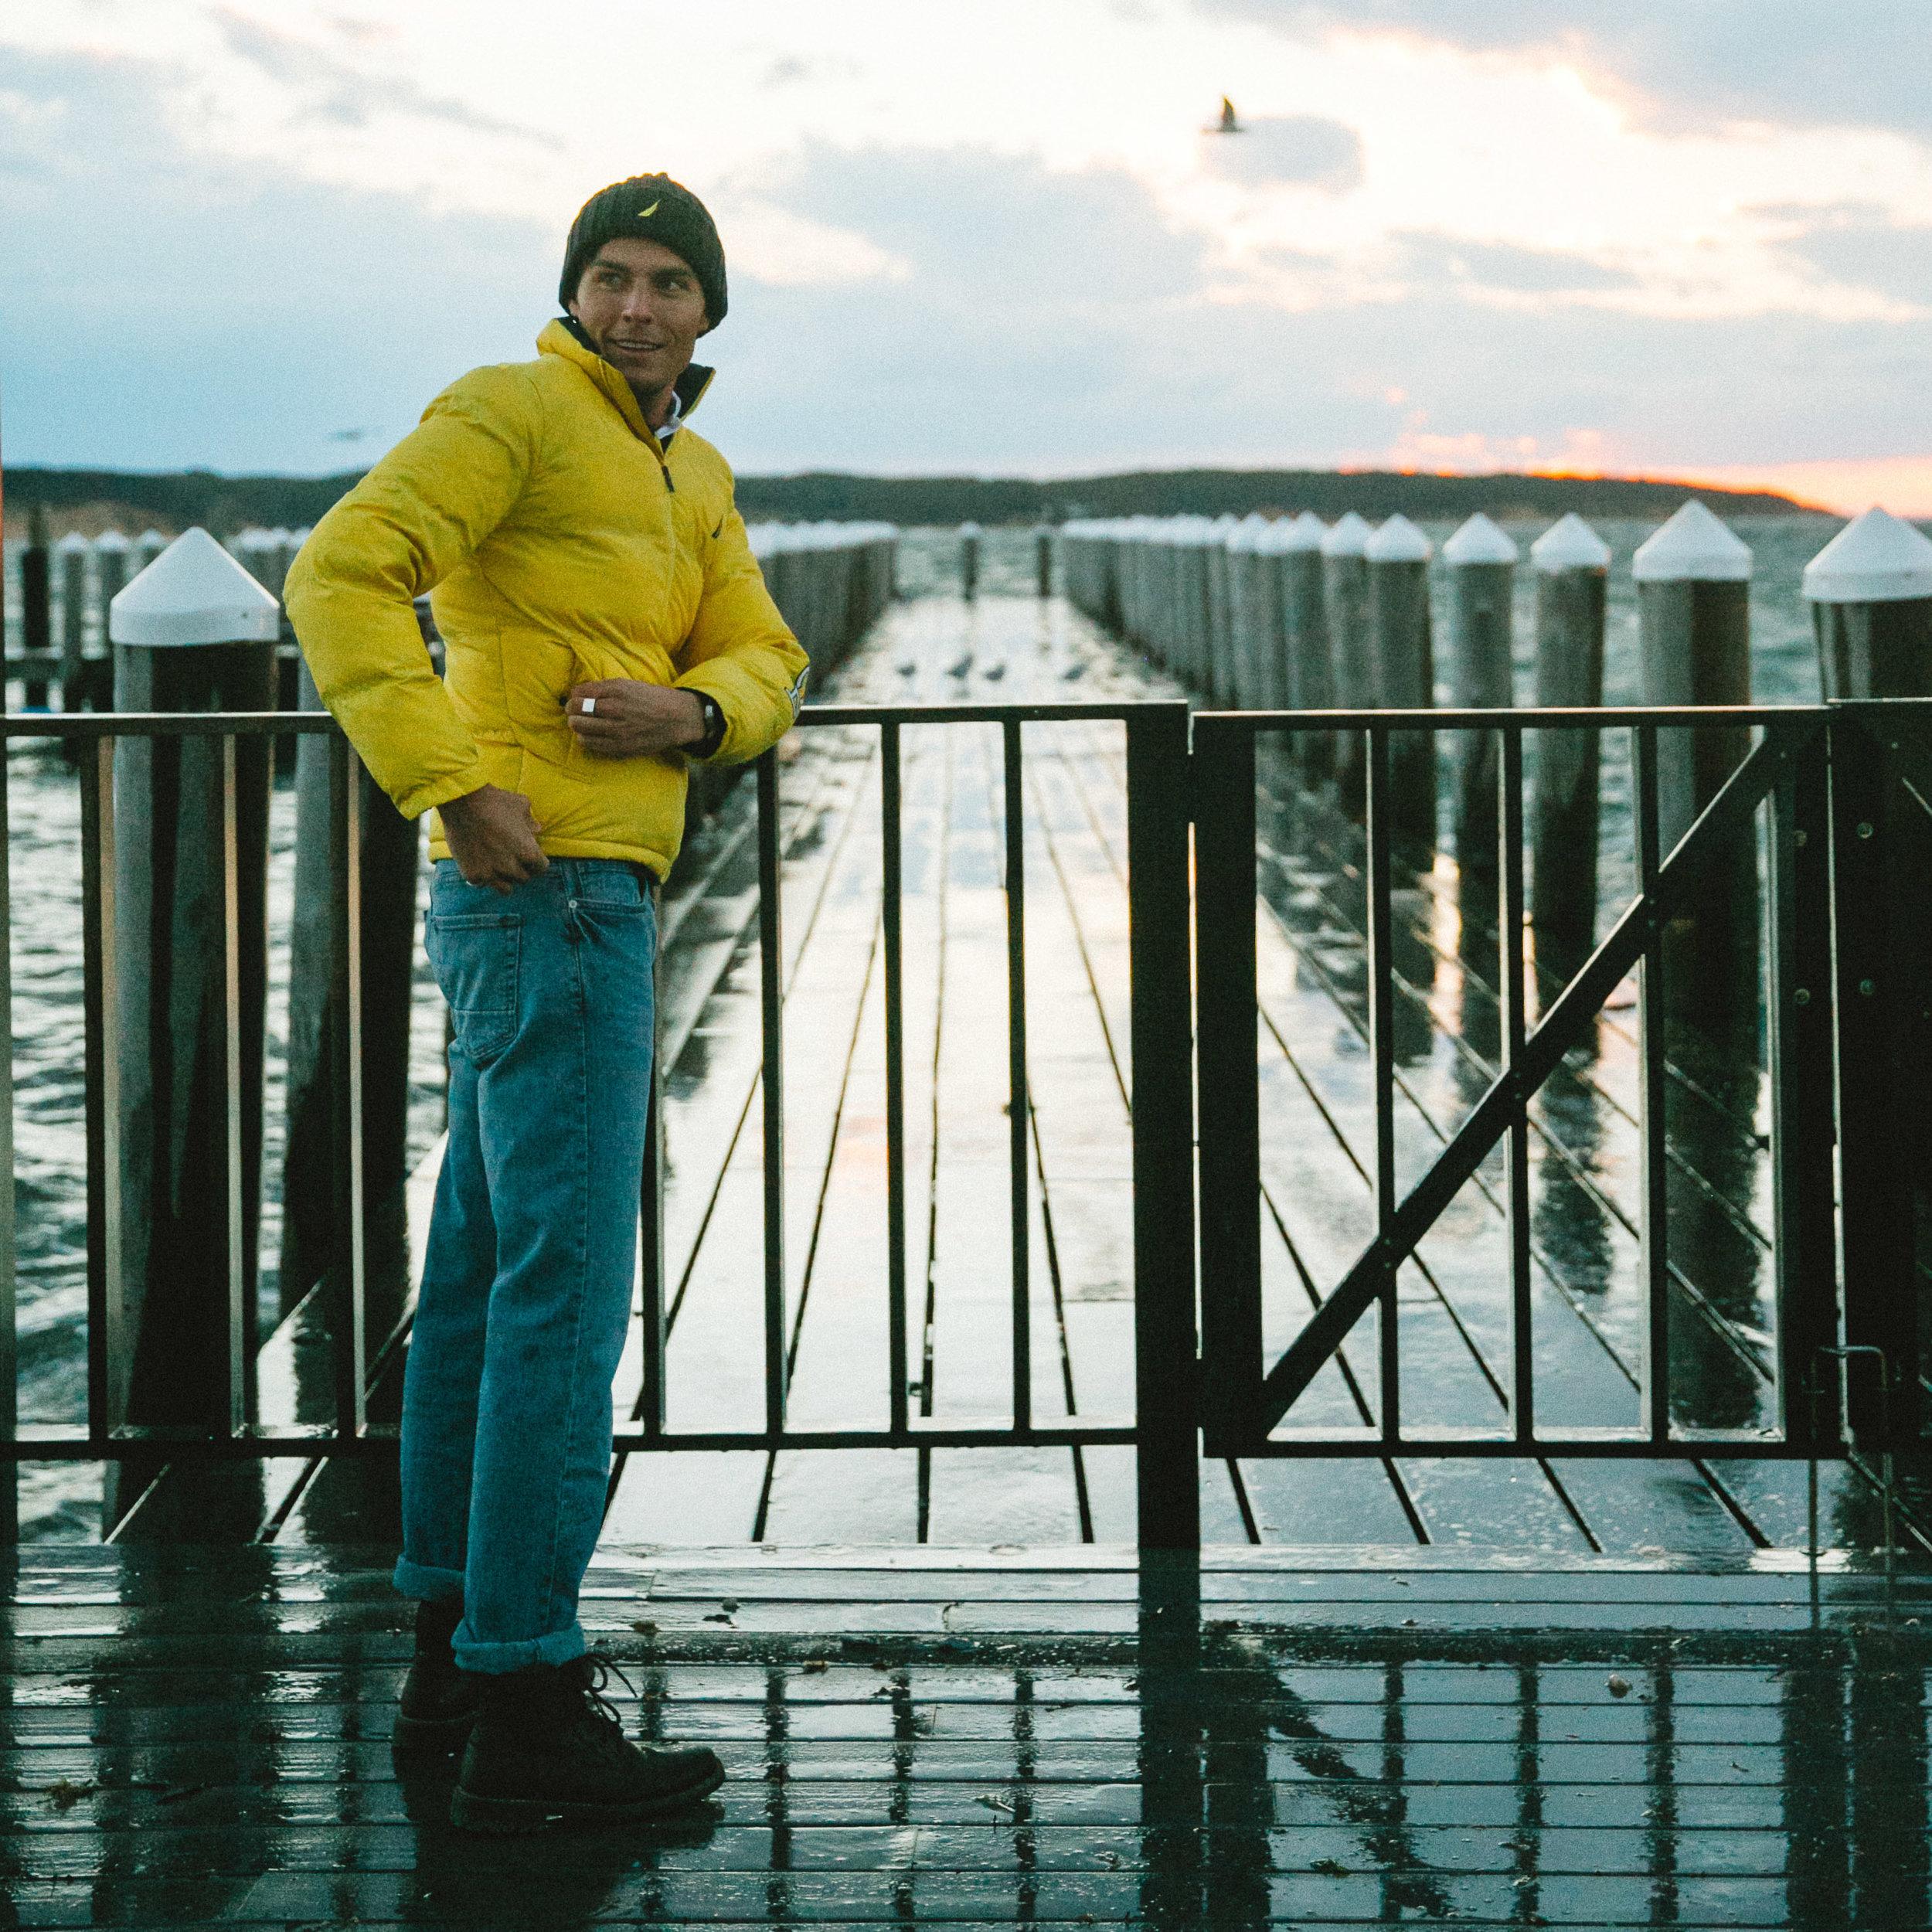 captainbarto-blog-adambartoshesky-model-viviankim-photo-nautica-client-theend-41.jpg